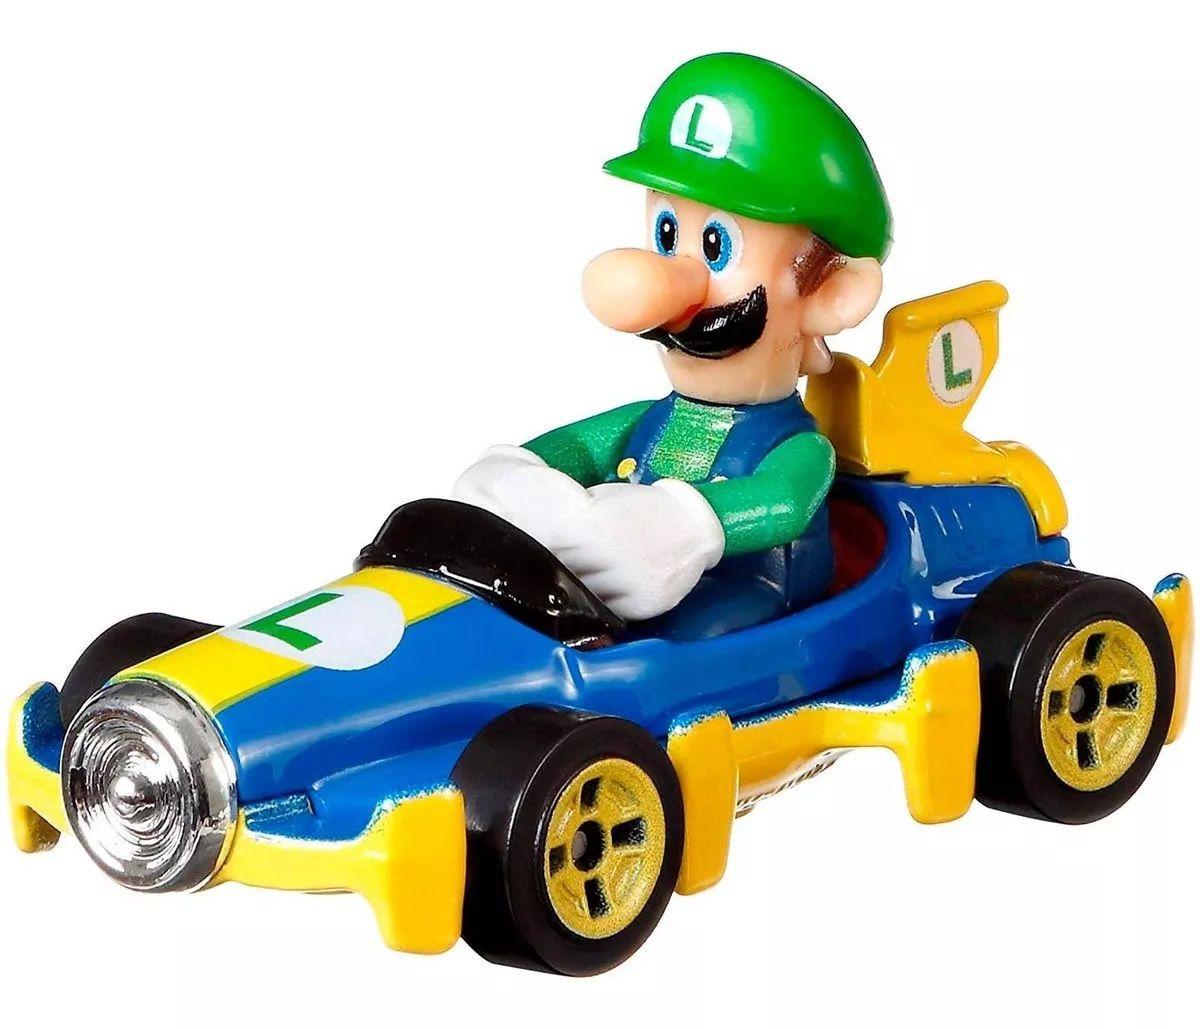 Carrinho Luigi (Mach 8): Mario Kart - Hot Wheels